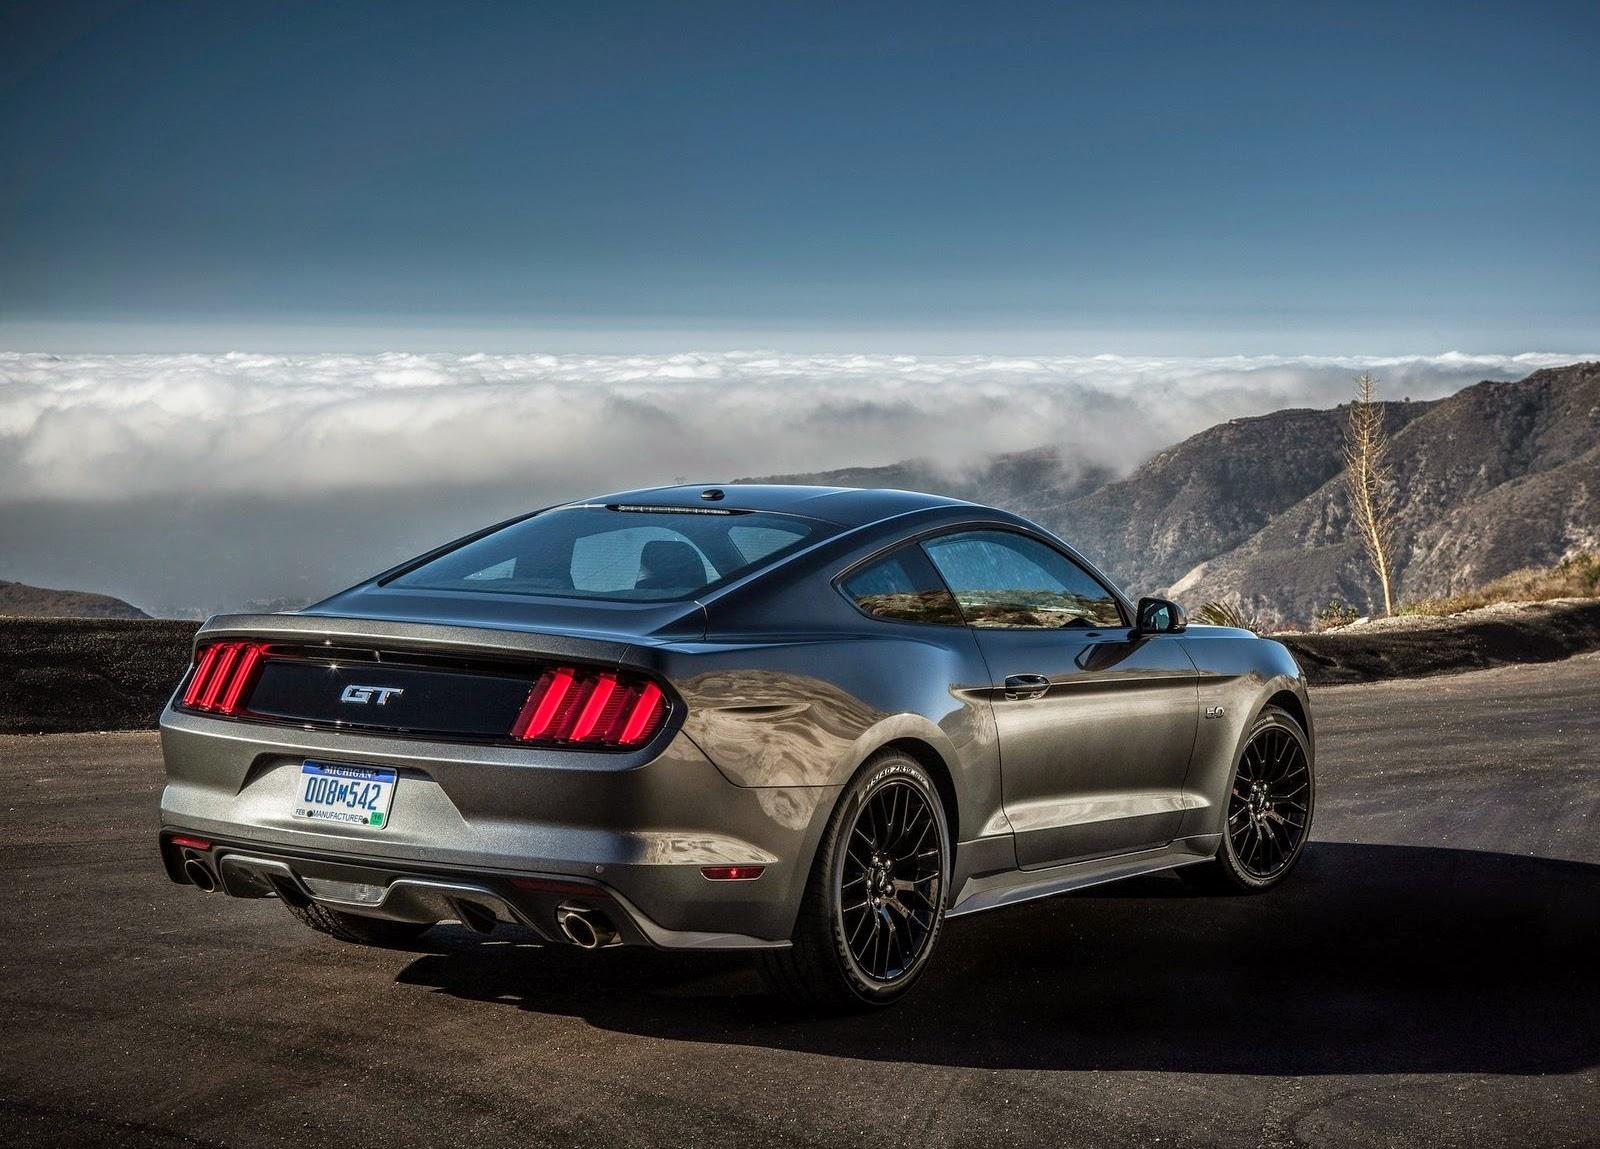 Best Wallpaper Logo Ford Mustang - for-mustang-gt-2015-car-wallpaper-2  Trends_183168.jpg